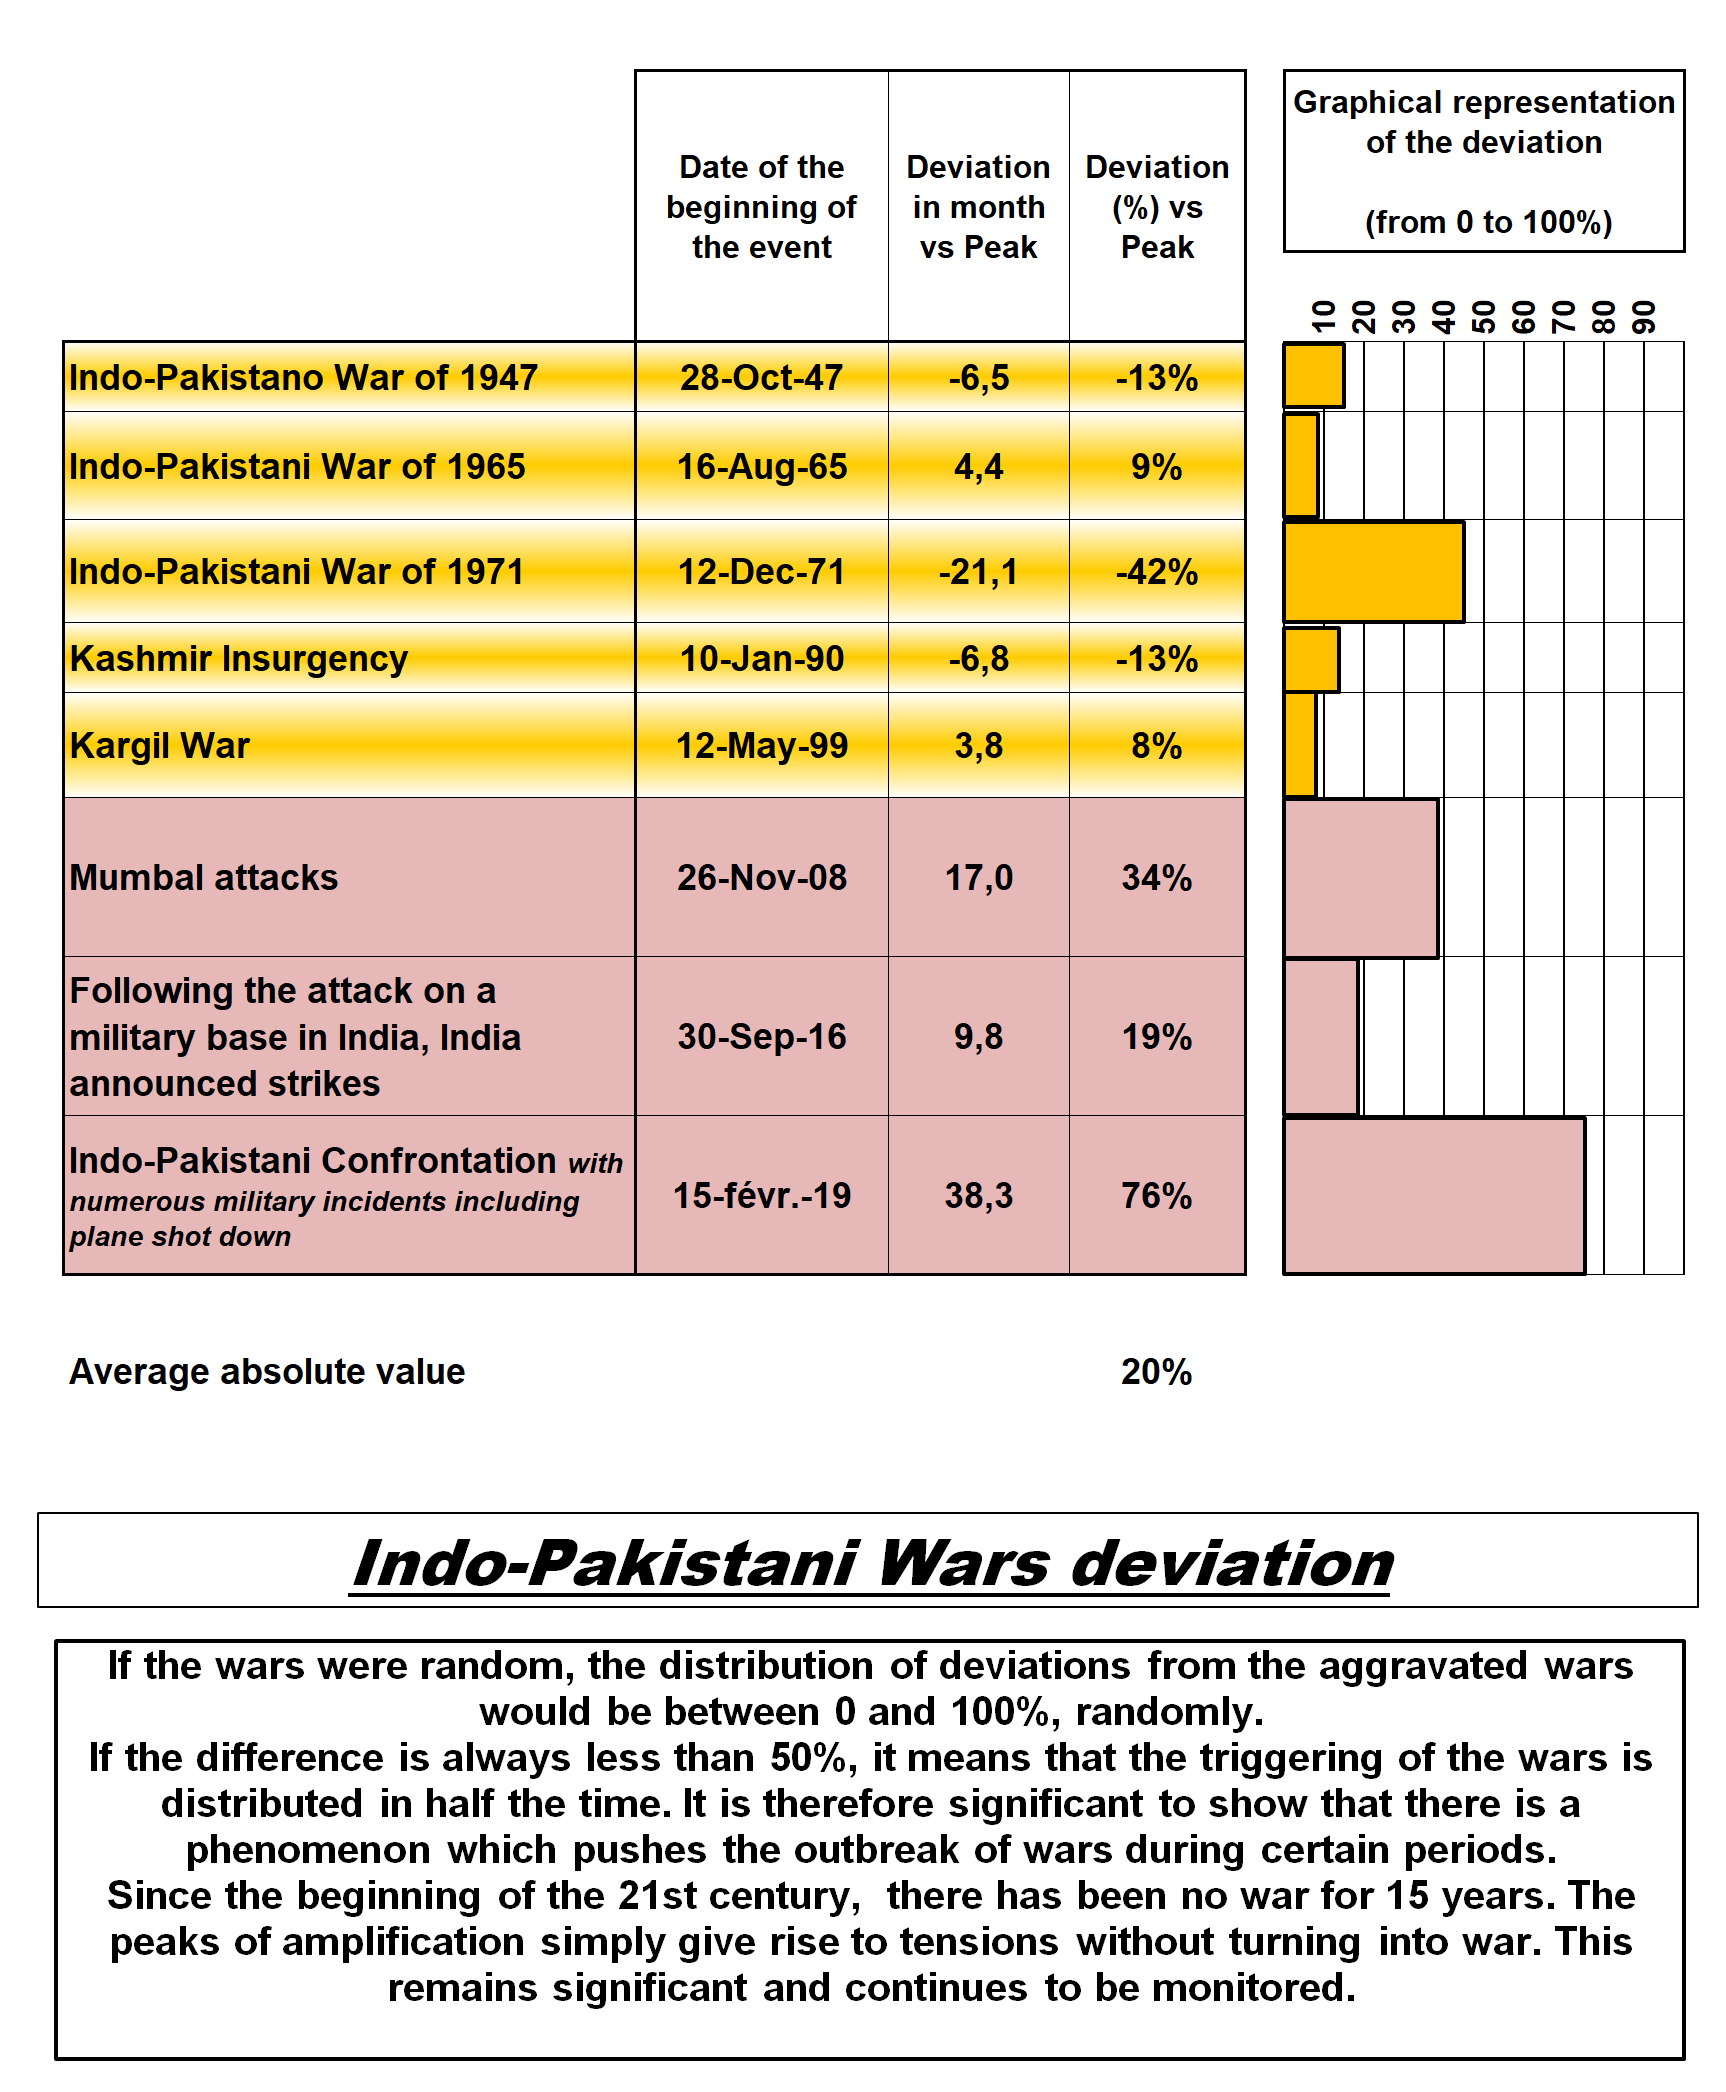 Indo-Pakistani Wars deviation